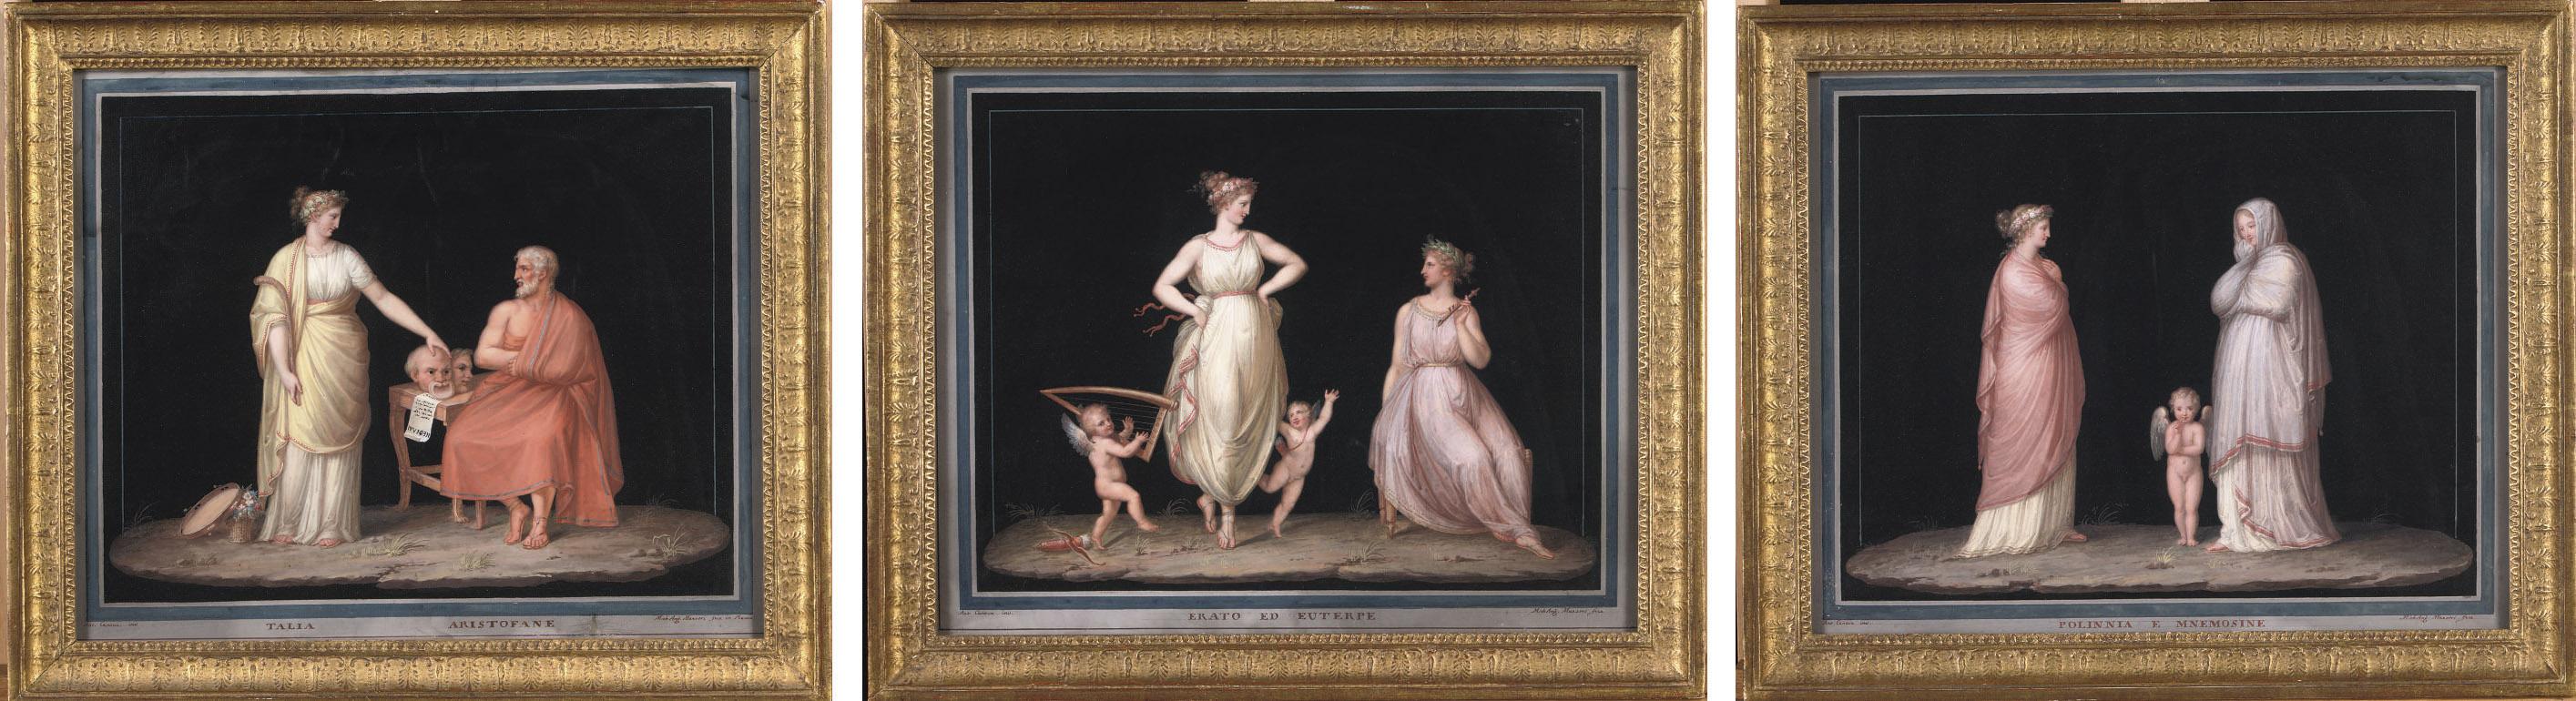 Erato ed Euterpe; Talia Aristofane; Polinnia e Mnemosine